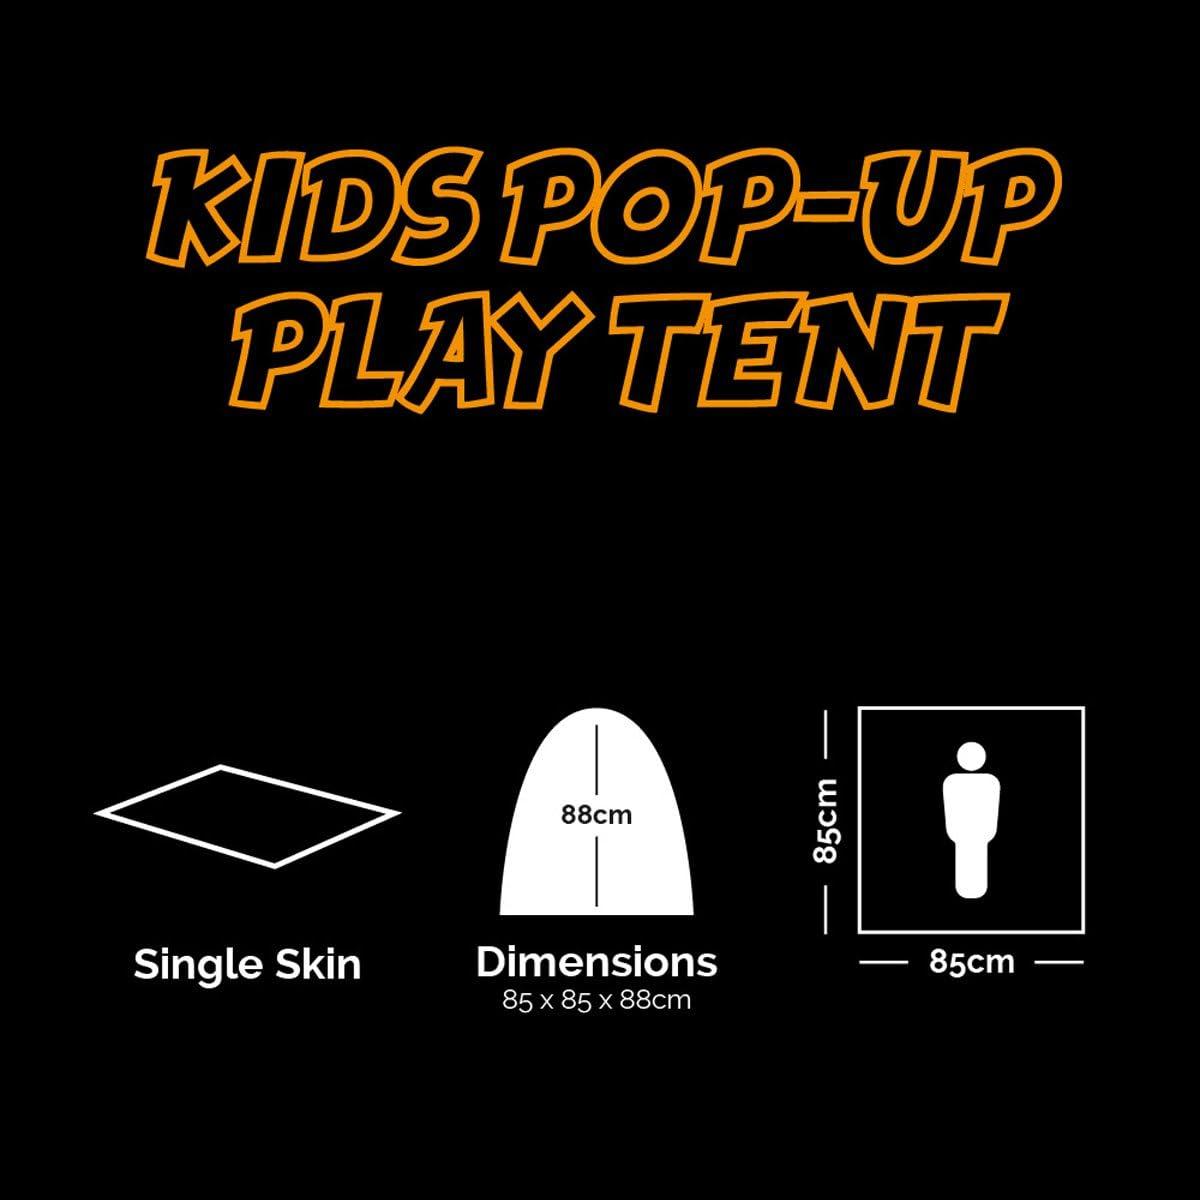 Motif Terrain Britannique Kombat UK Kids Pop-up Jouer Tent-BTP